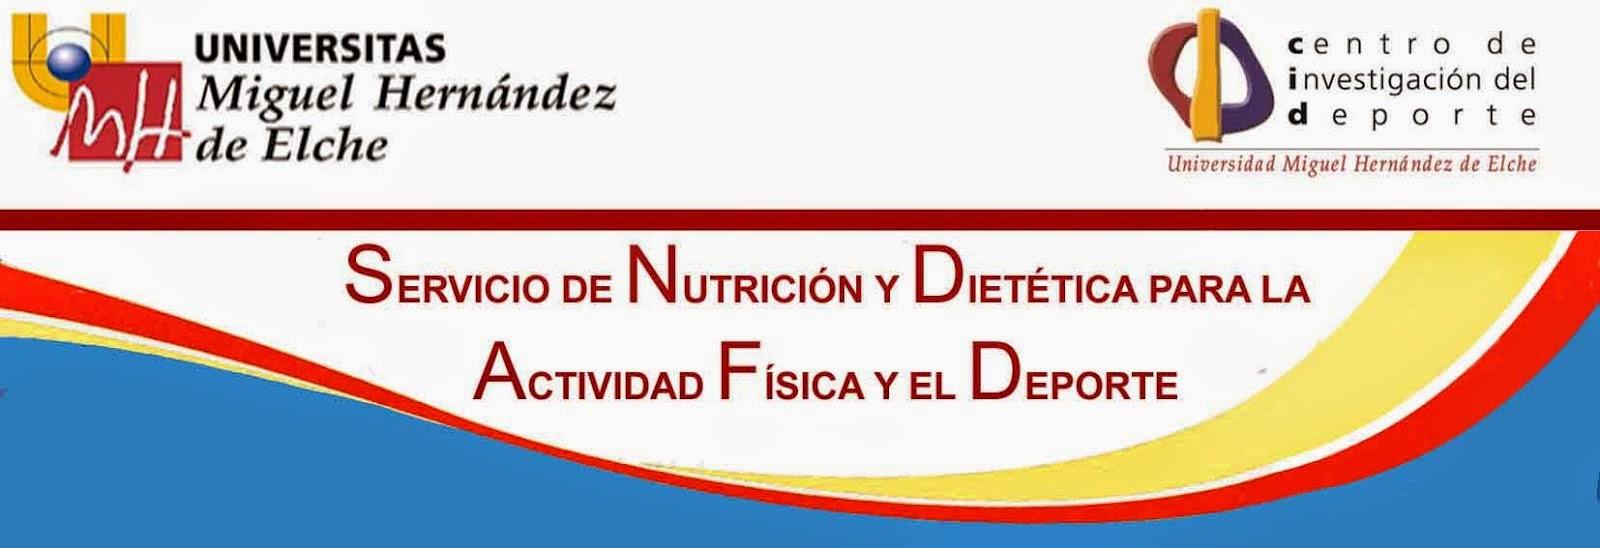 <center>Servicio de Nutrición y Dietética Deportiva UMH</center>